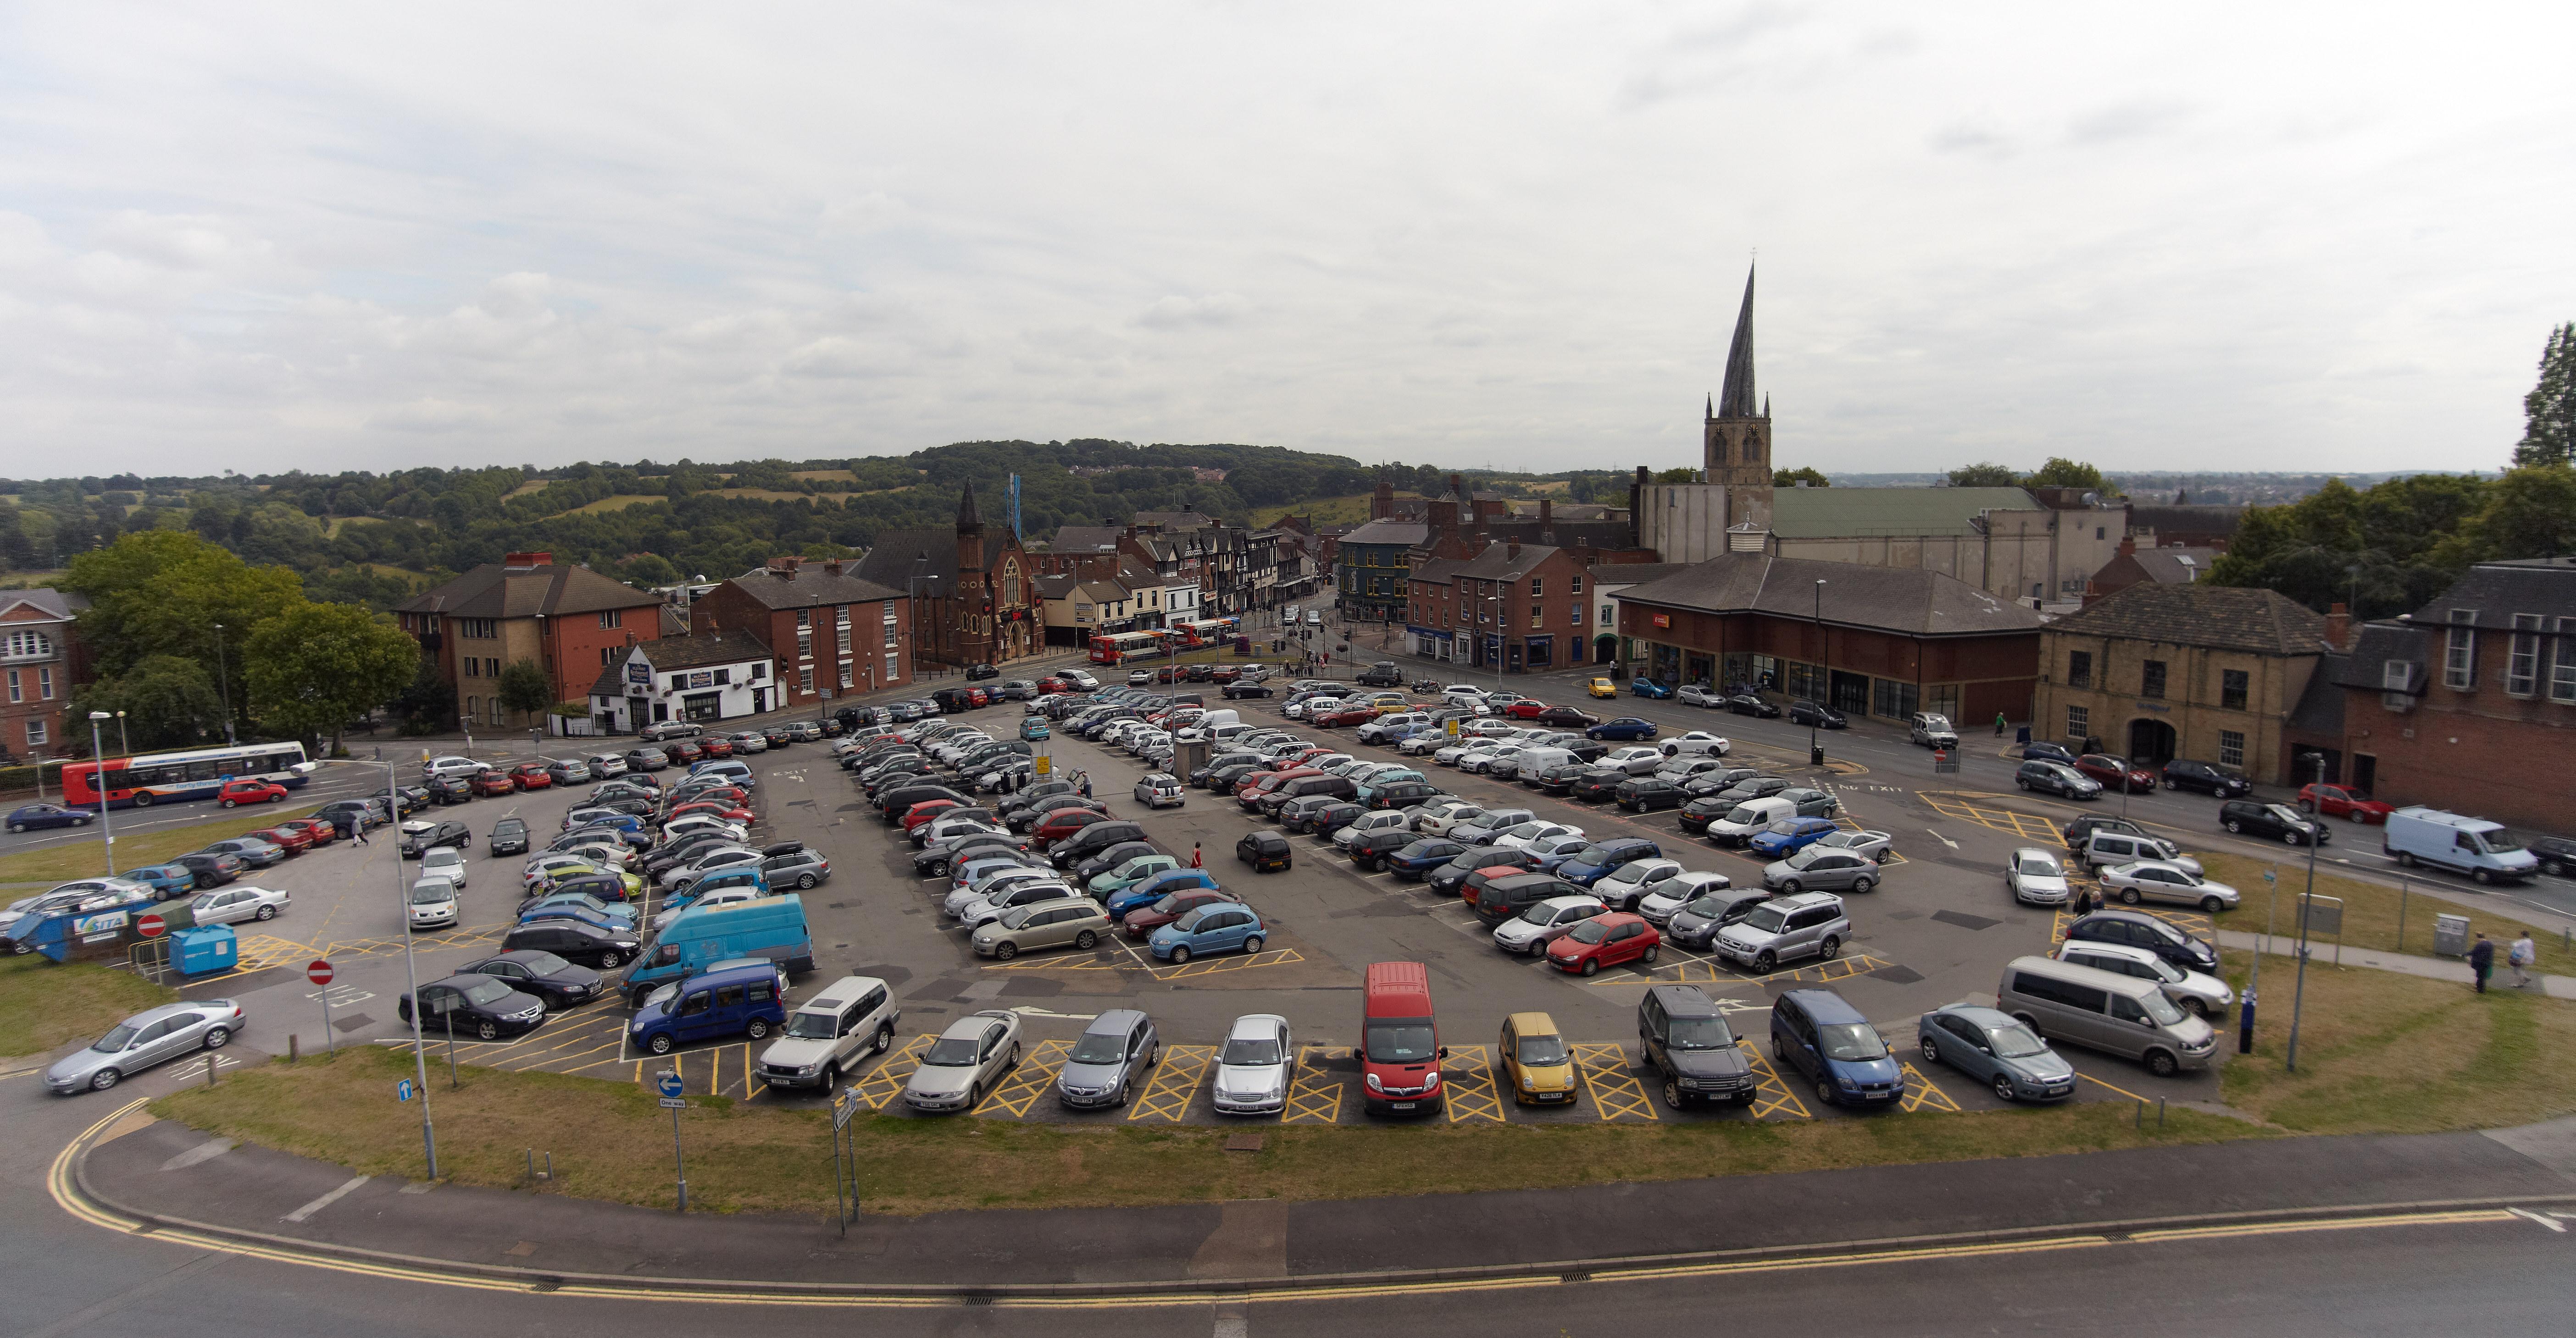 Holywell Kreuz Parkplatz Chesterfield